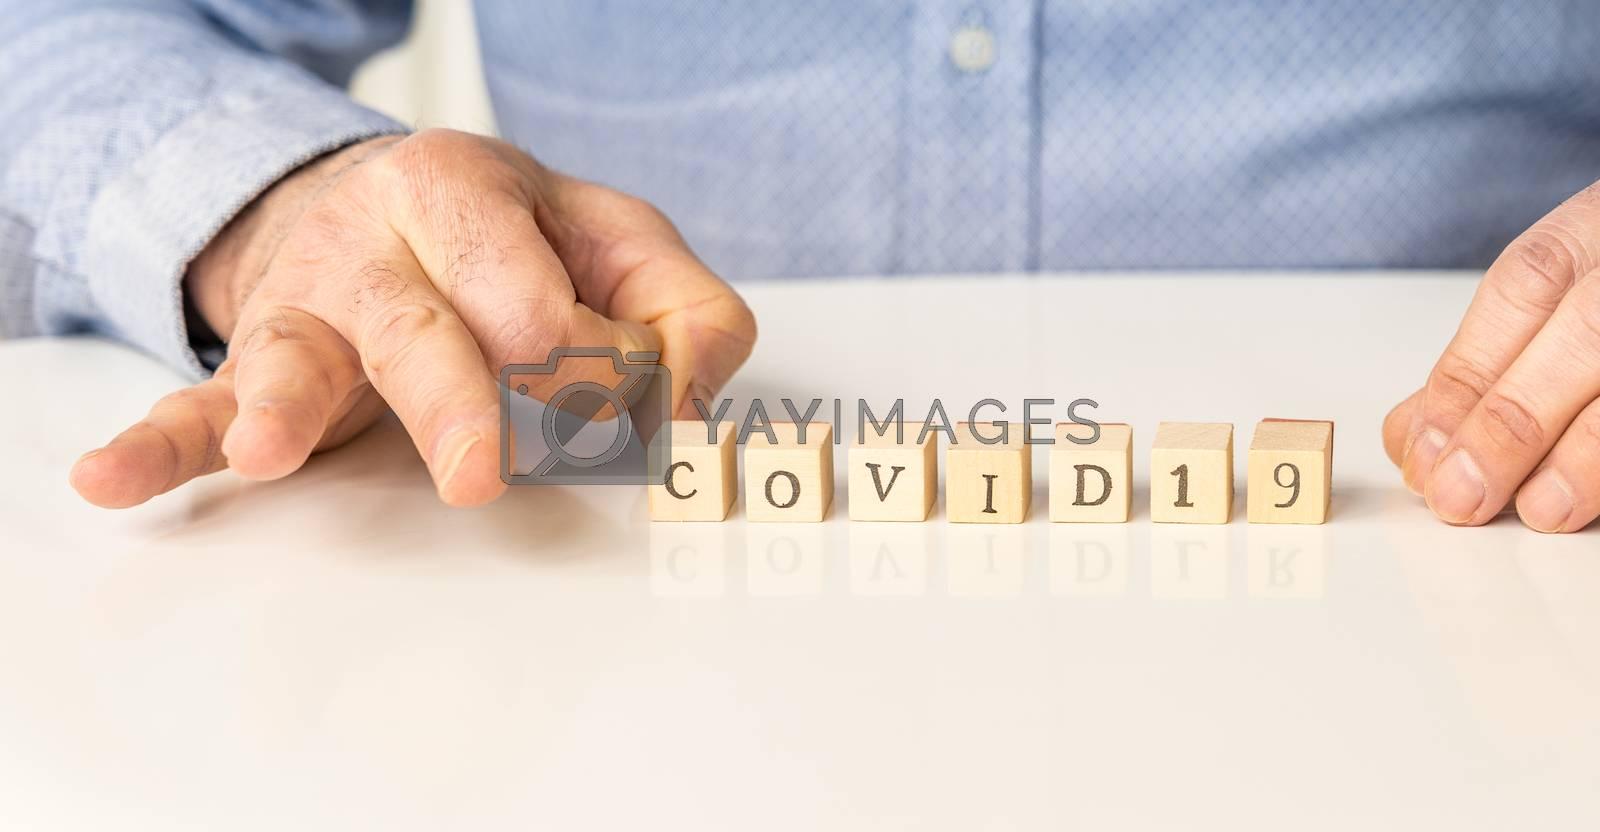 Covid 19 and coronavirus disease conceptual image on wood.